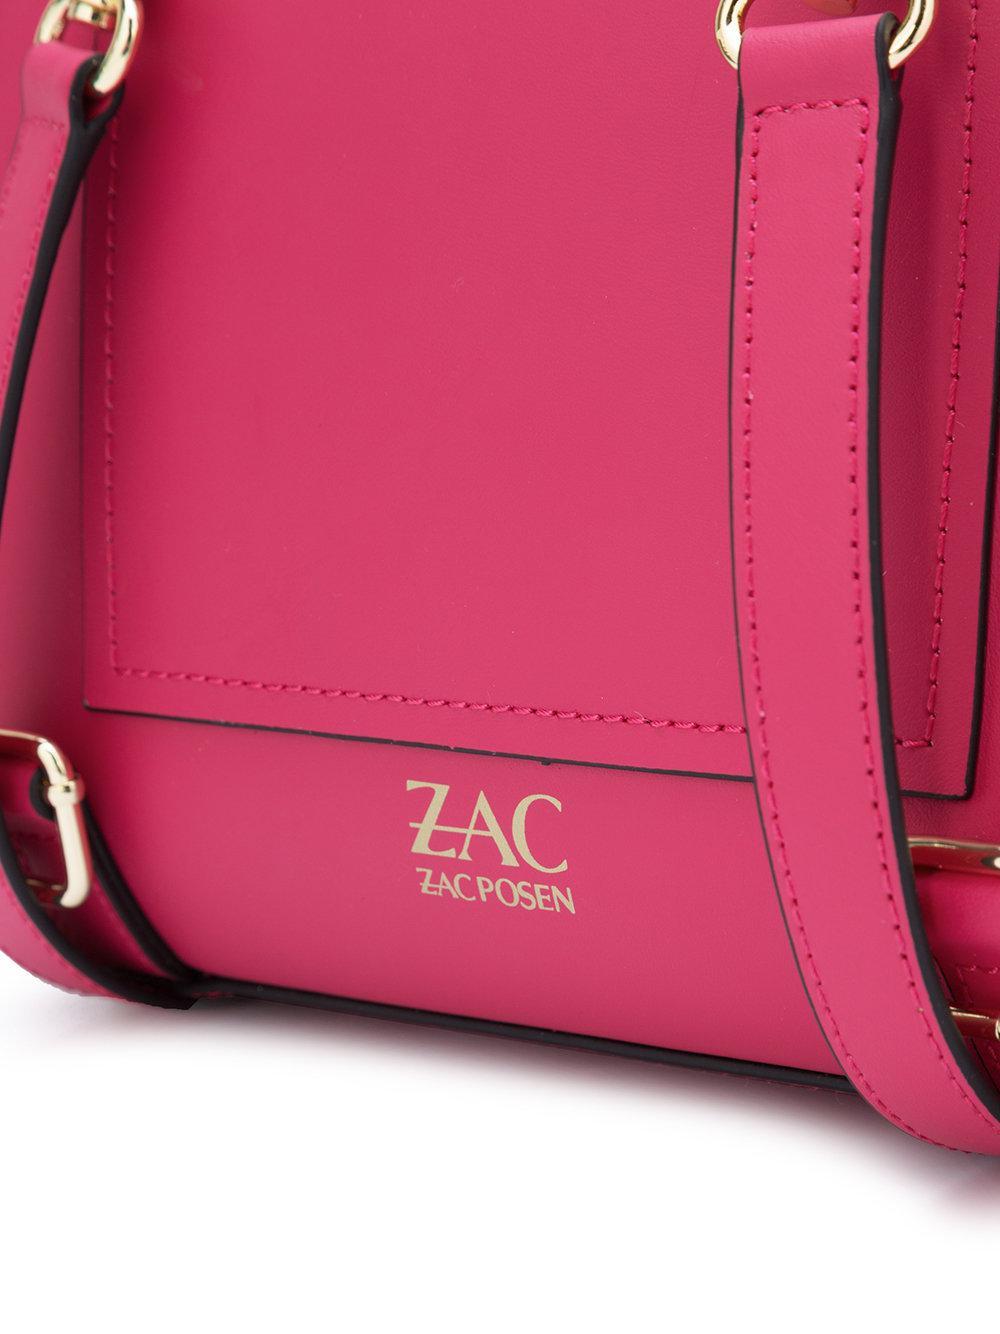 Zac Zac Posen Leather Eartha Iconic Charm Backpack in Pink & Purple (Pink)